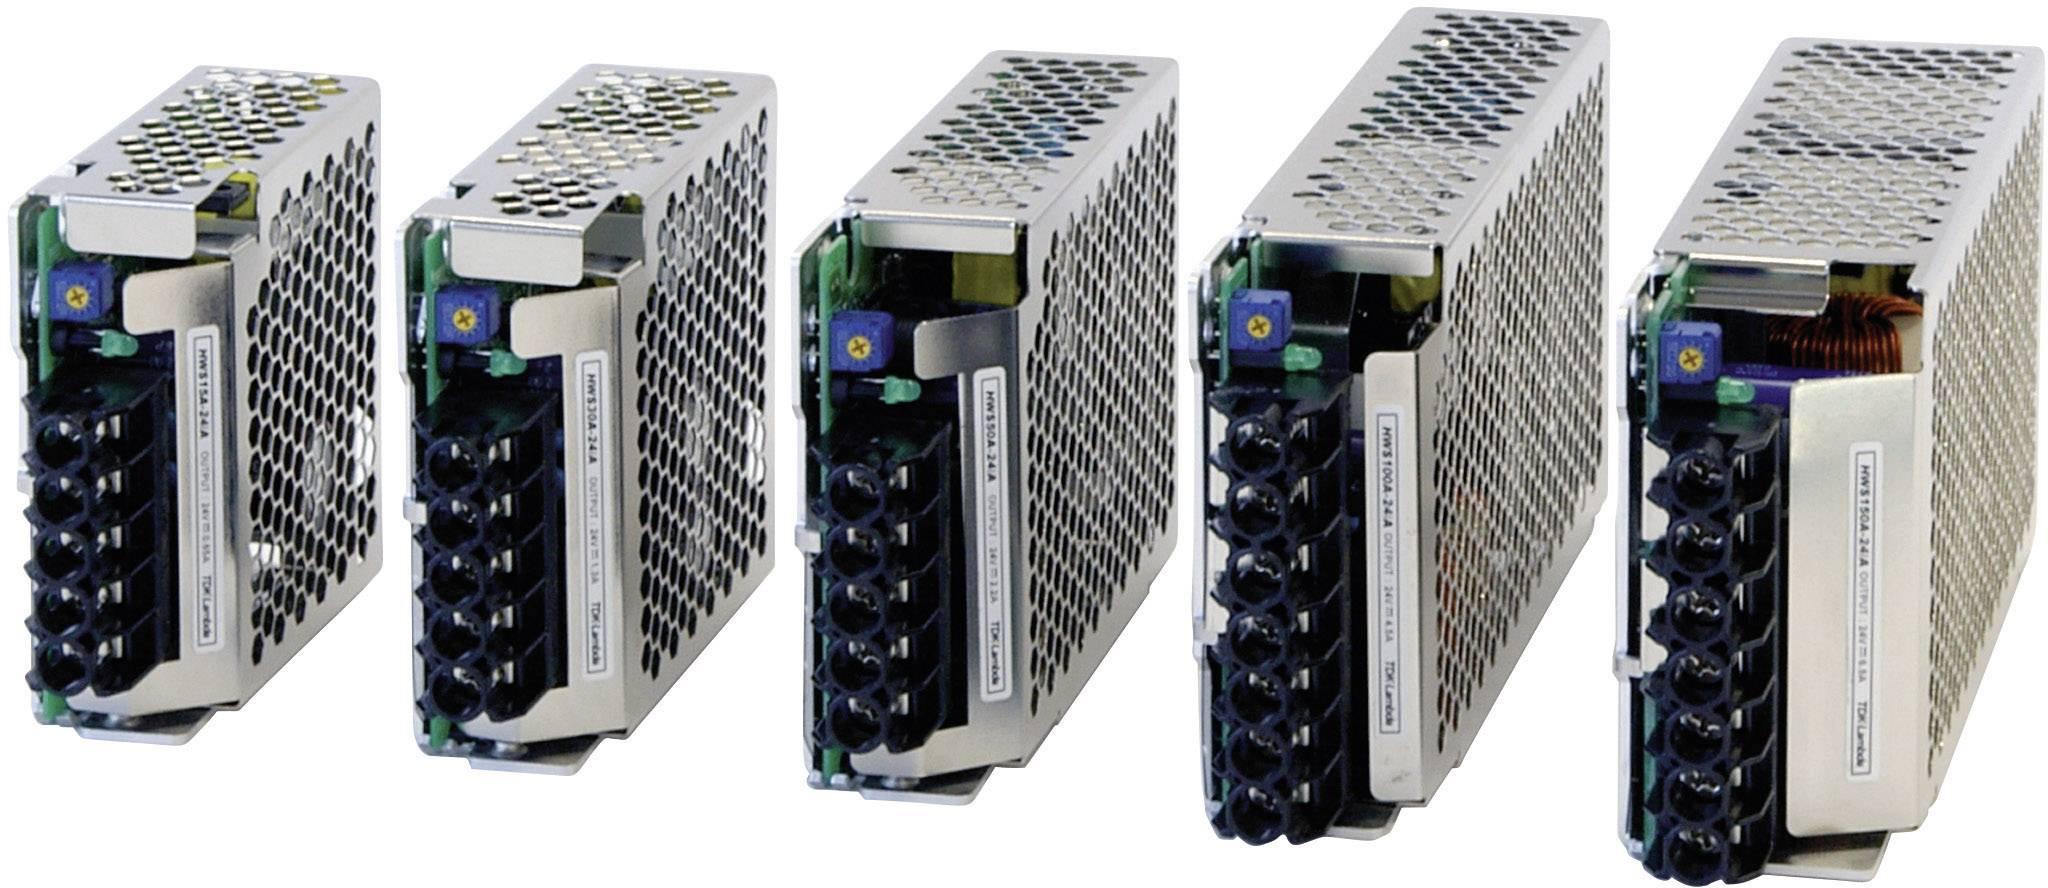 Zabudovateľný napájací zdroj TDK-Lambda HWS-100A-5, 5 V, 100 W